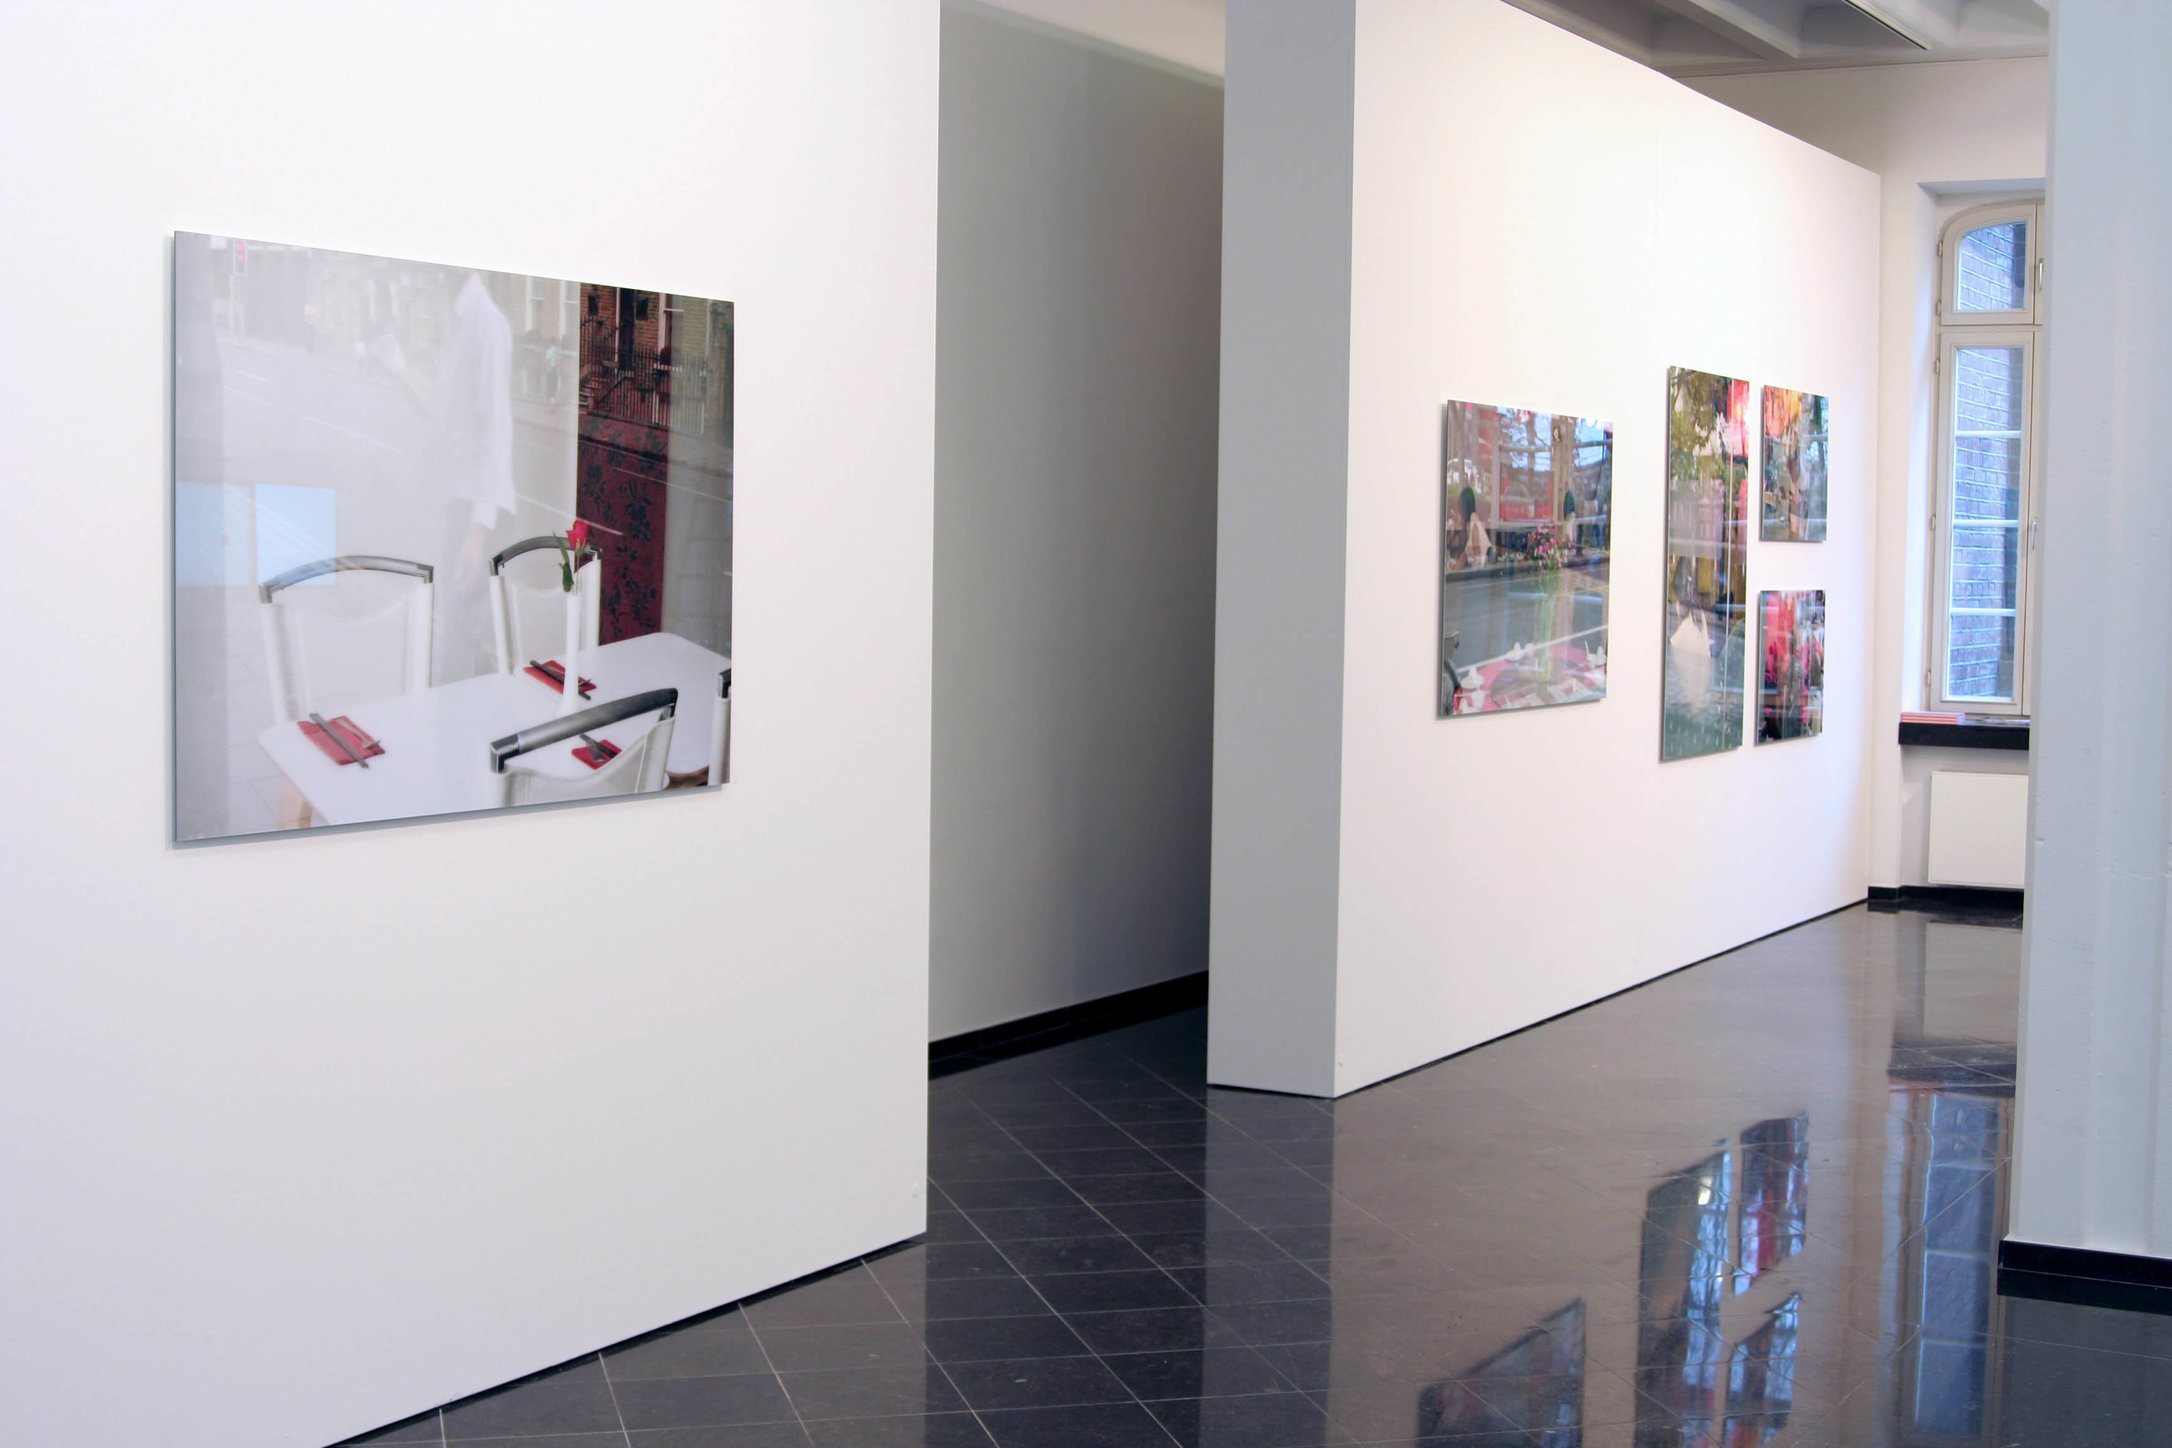 all_the_stories_10_Ausstellungsansicht_GaleriegeuerBreckner.jpg